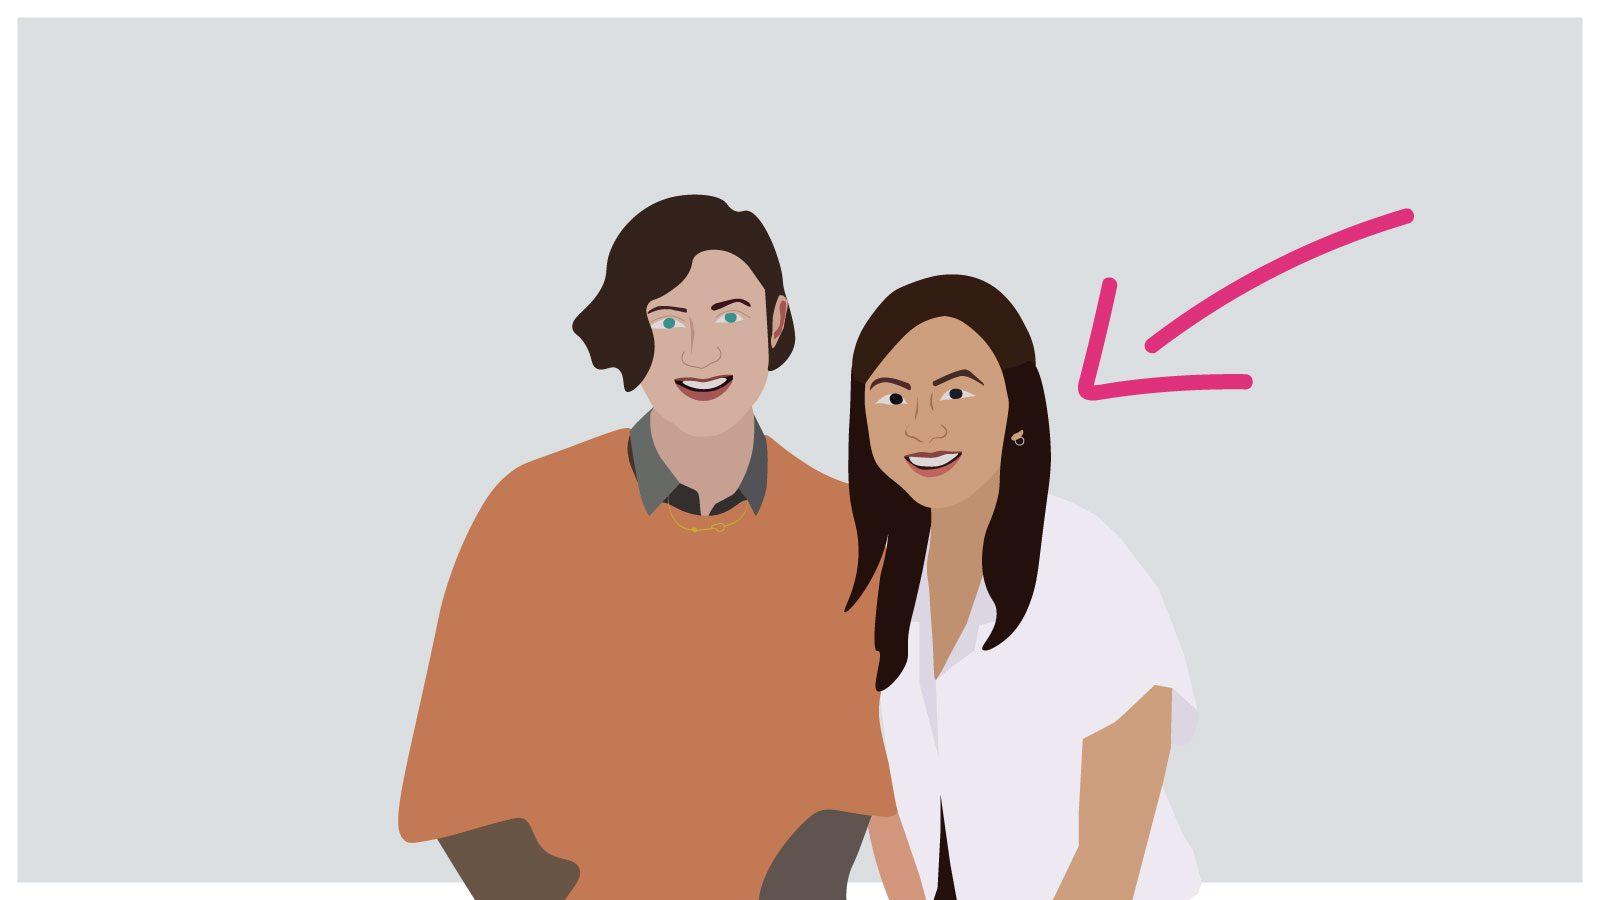 Leanna's Communications Internship Blog